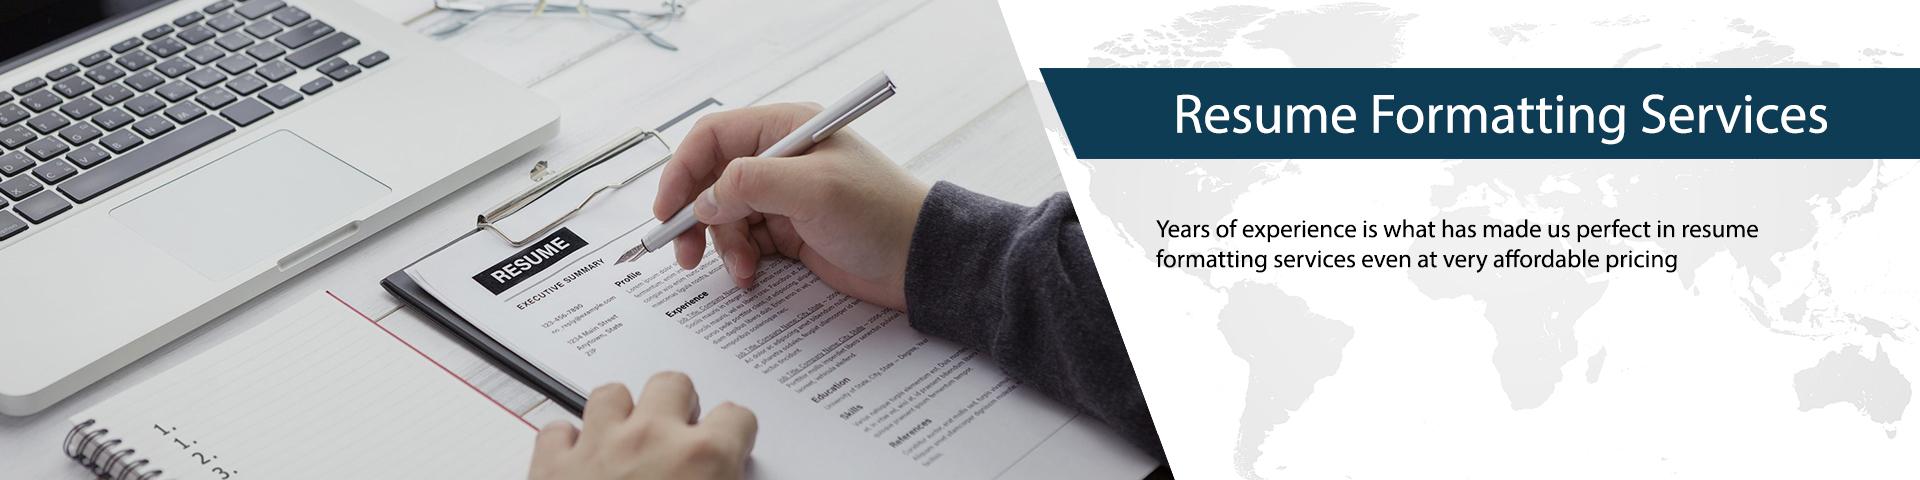 Resume Formatting Services